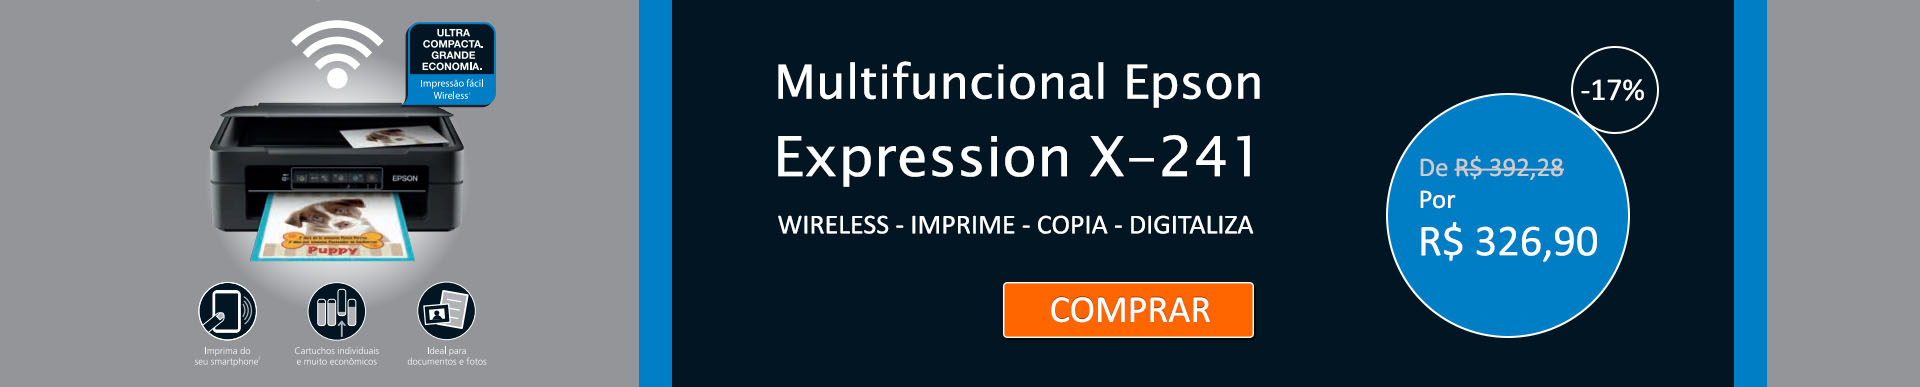 Multifuncional Epson Expression X-241